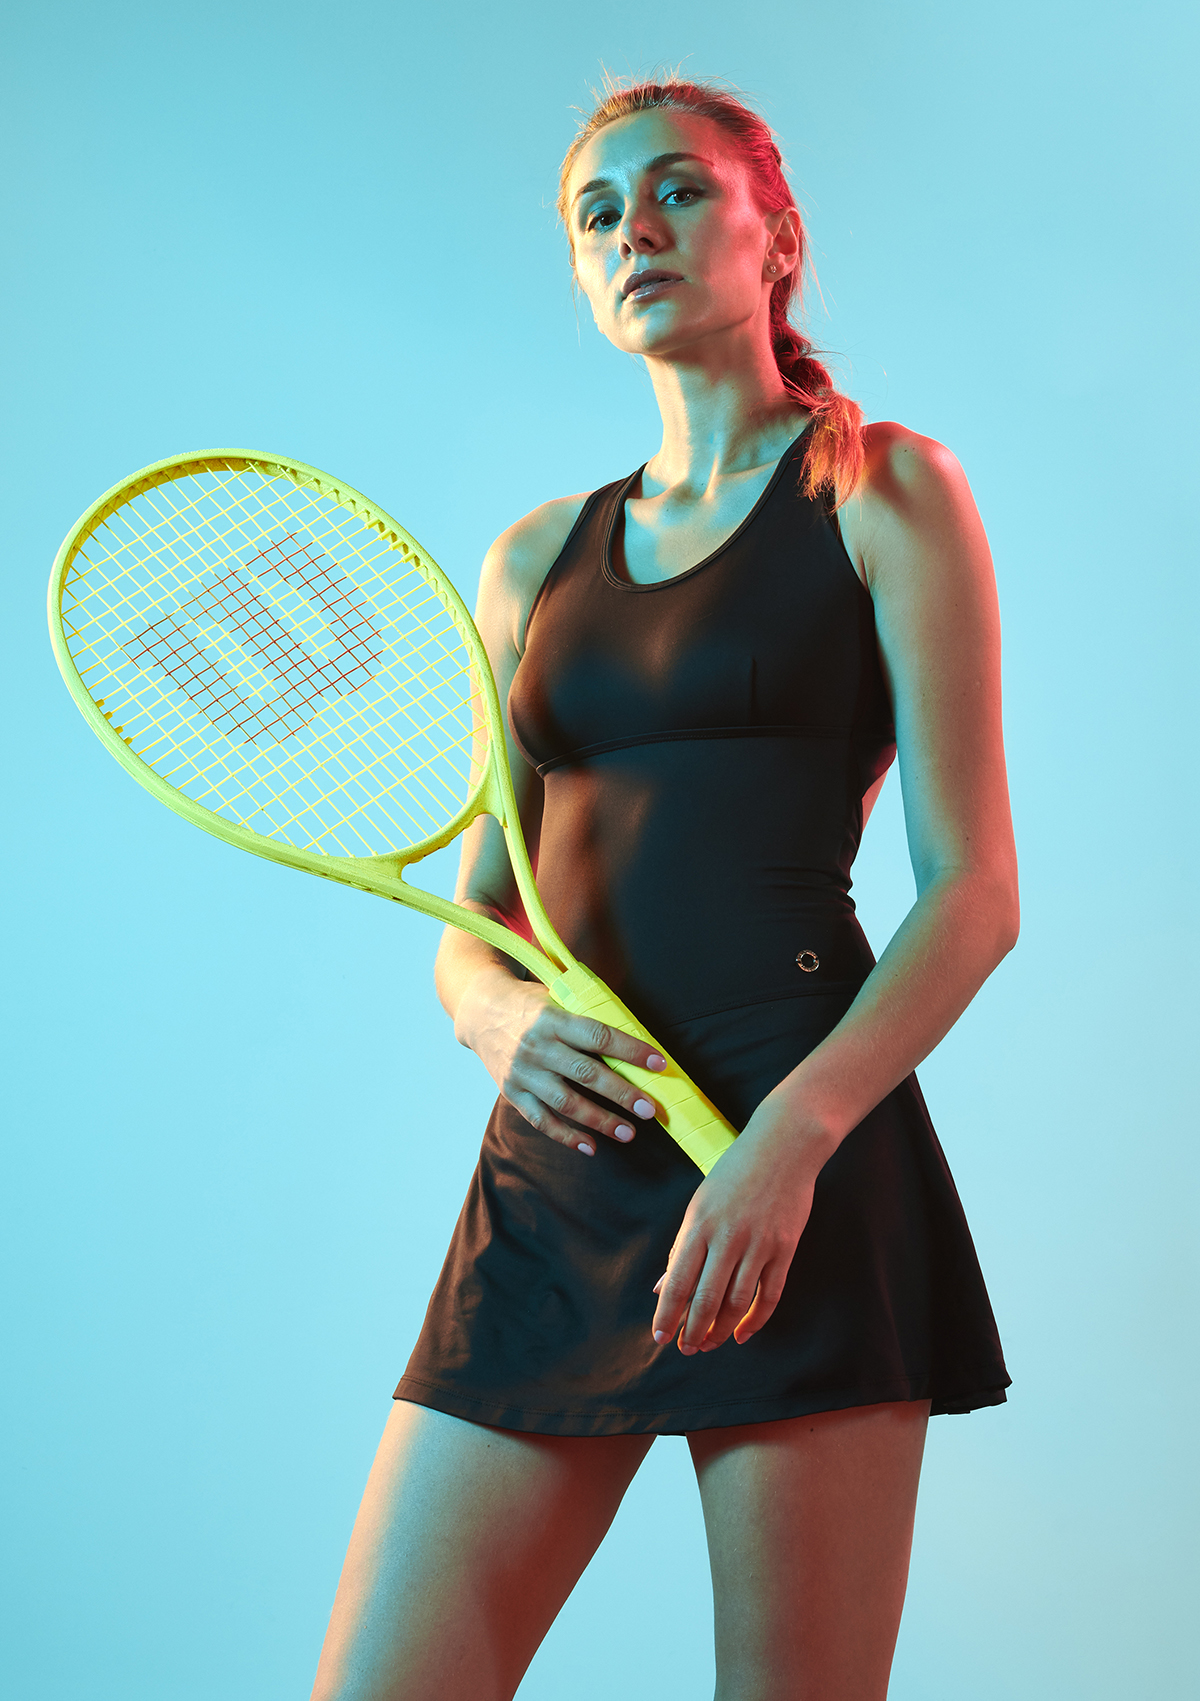 20181111_Tennis11884_FINAL_WEB.jpg